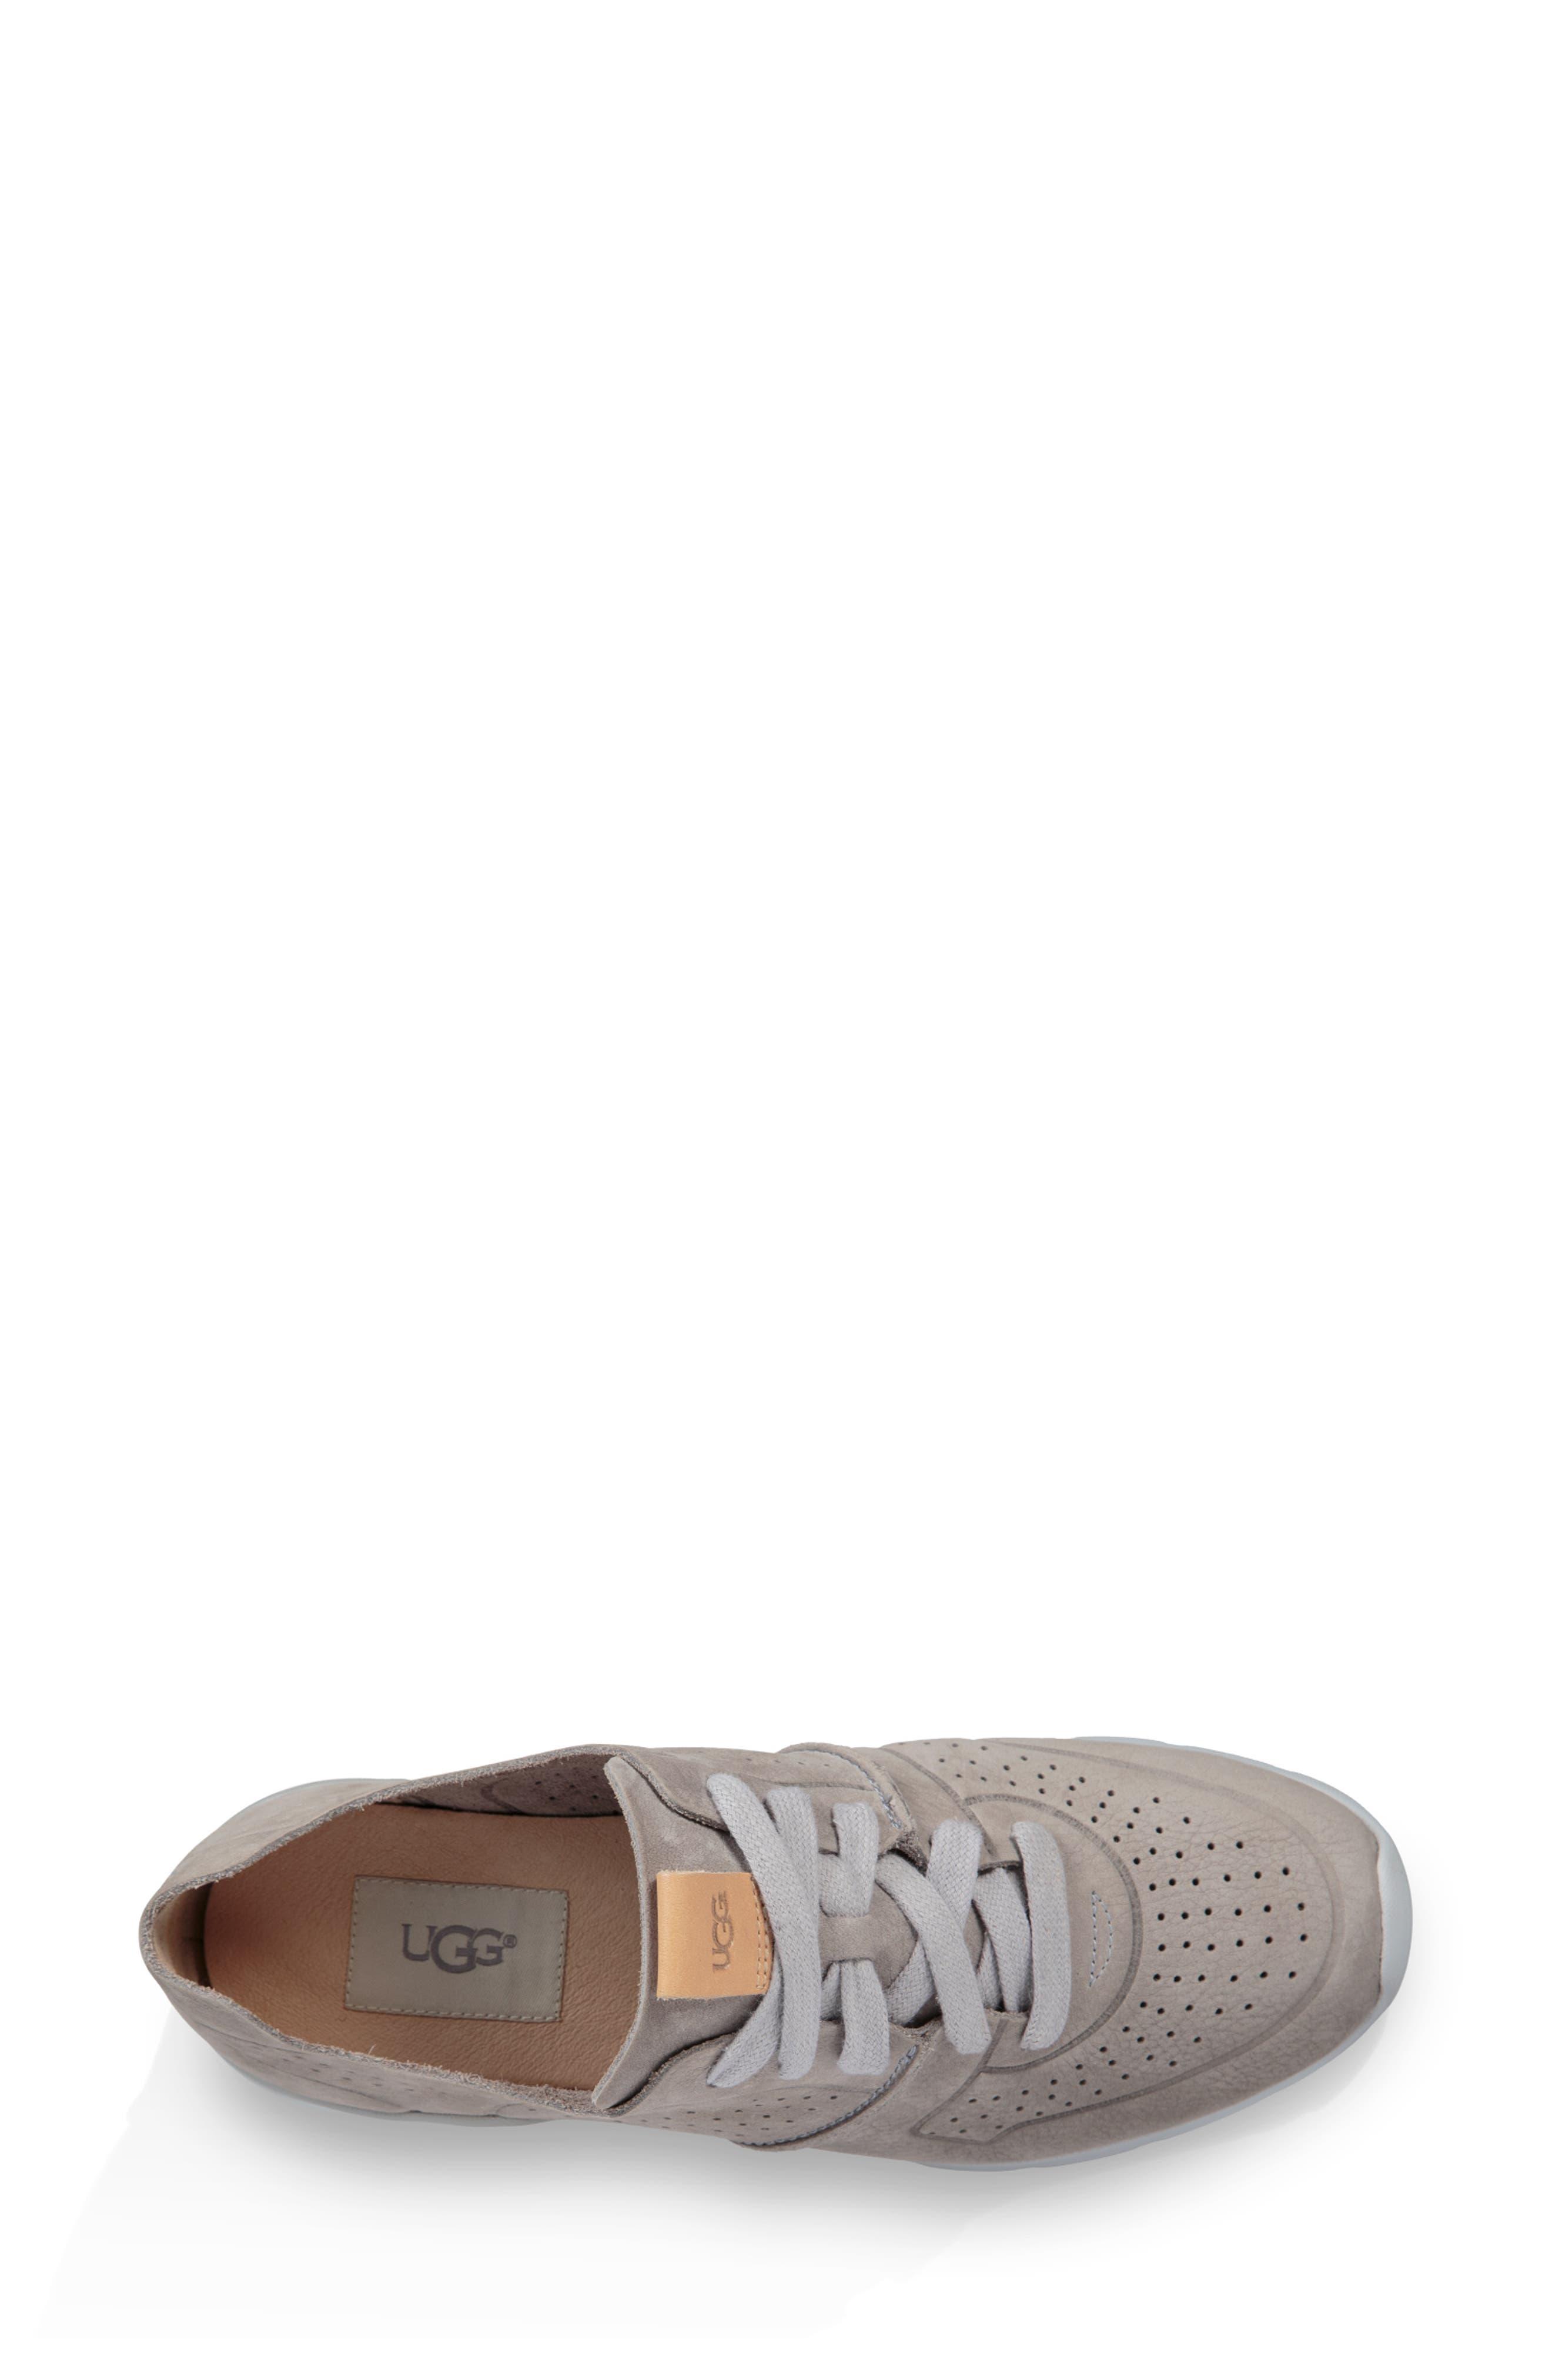 UGG<SUP>®</SUP>, Tye Sneaker, Alternate thumbnail 4, color, 024